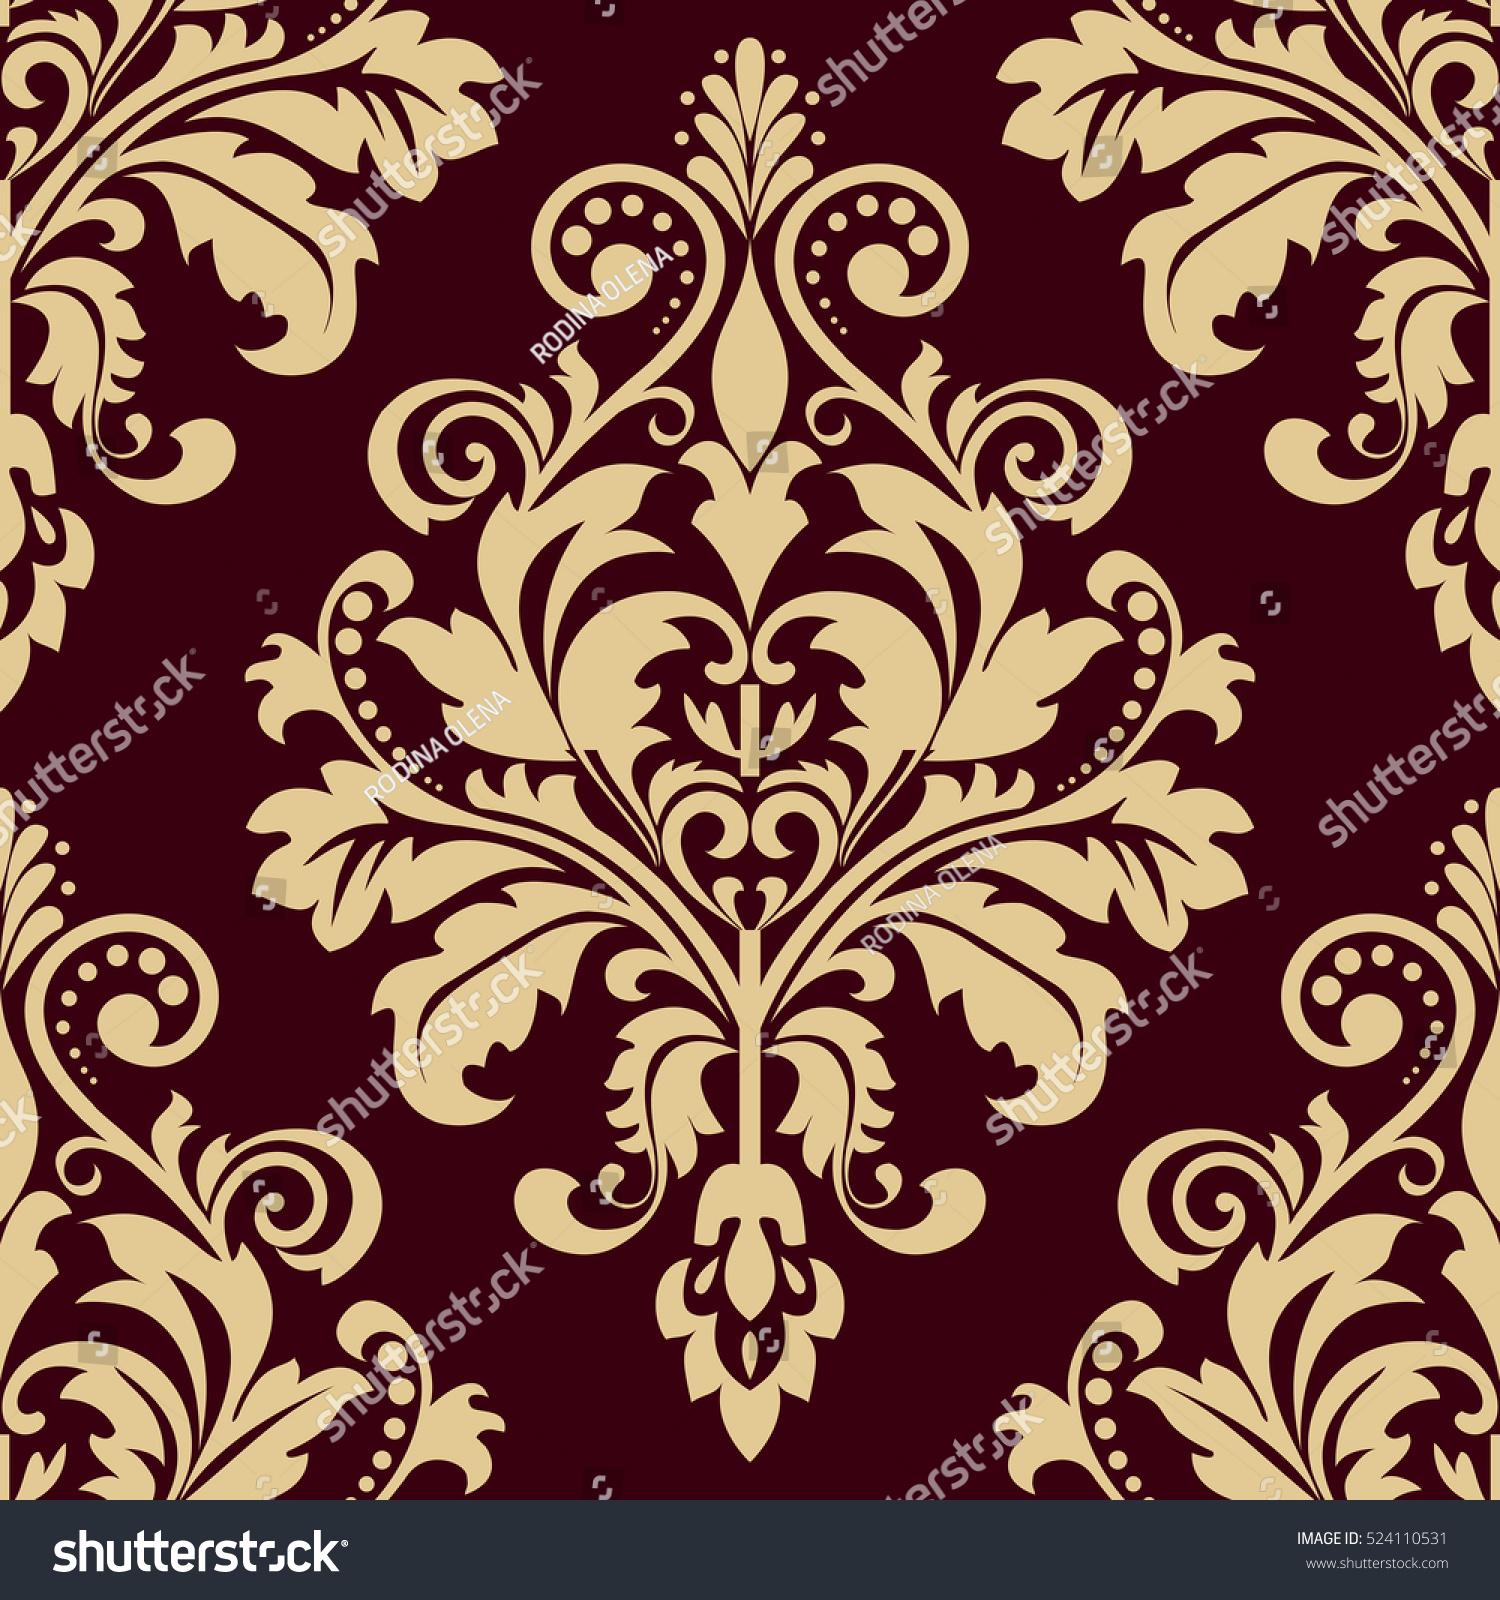 baroque print wallpaper - photo #20